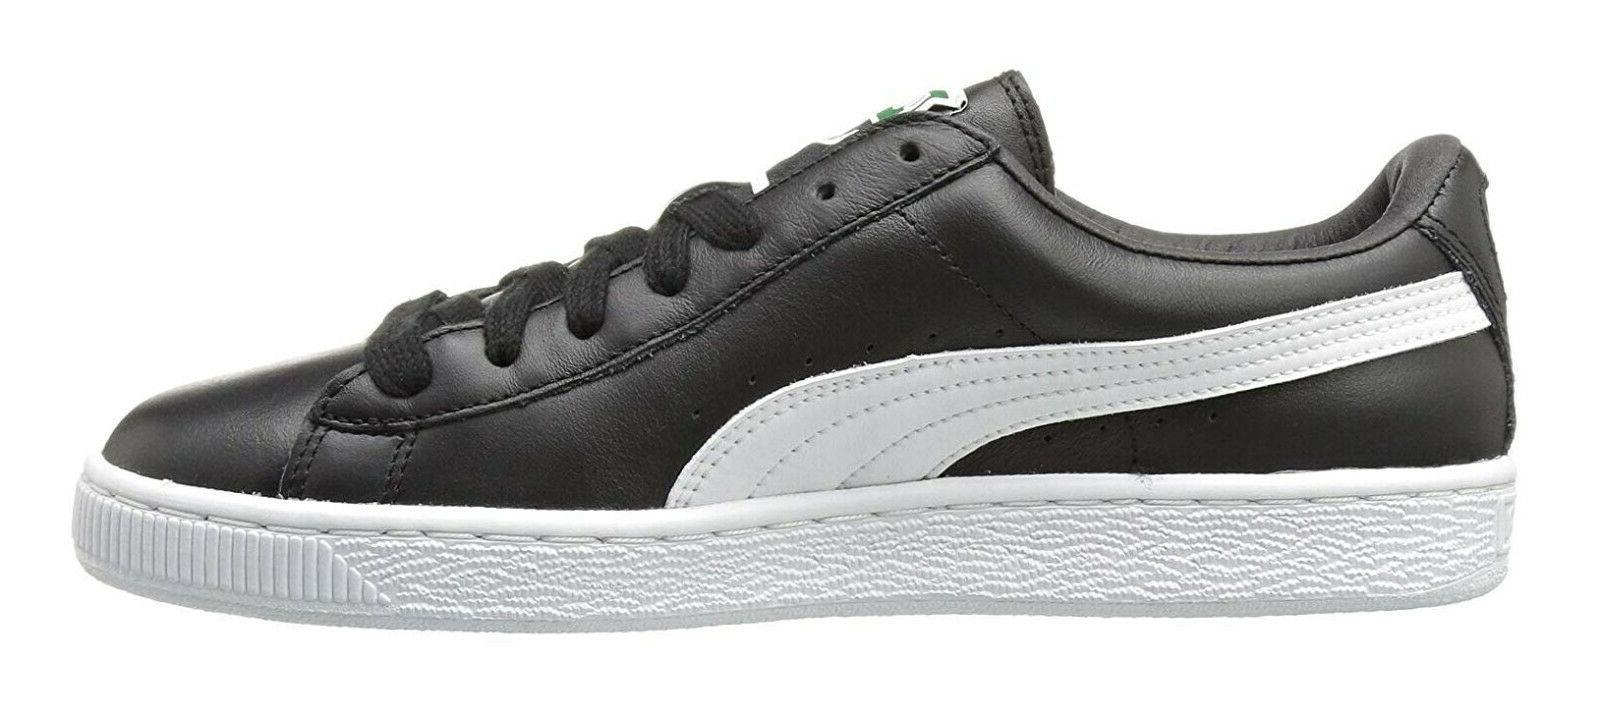 PUMA Classic LFS Black White Tennis Shoes Item 354367 21